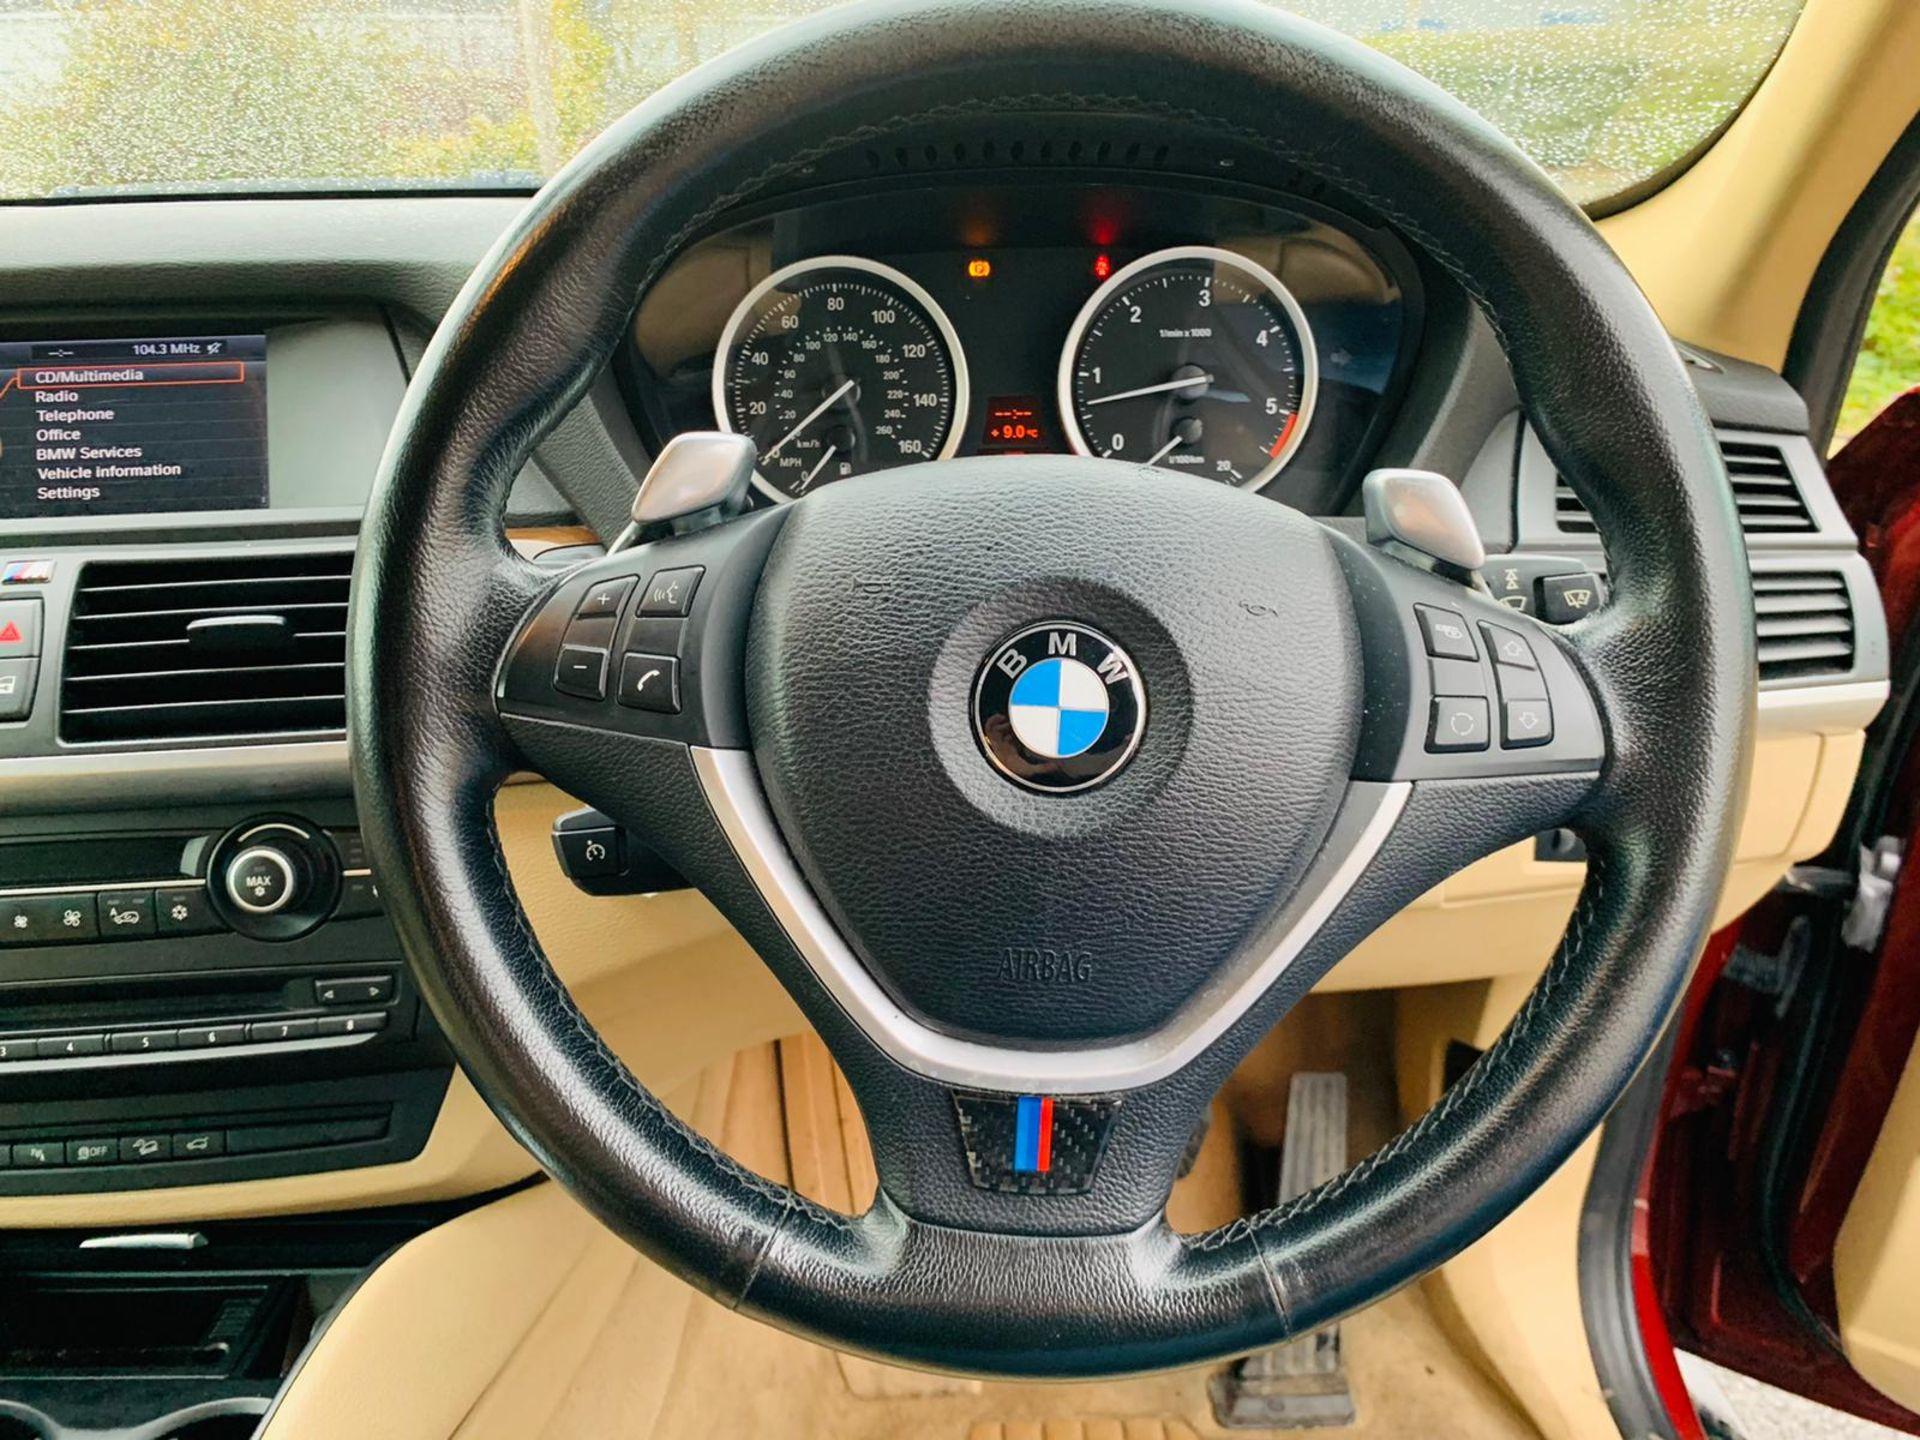 Reseve Met - BMW X6 xDrive 3.0d Auto - 2014 Reg - Leather Interior -Parking Sensors - Reversing Cam - Image 26 of 30